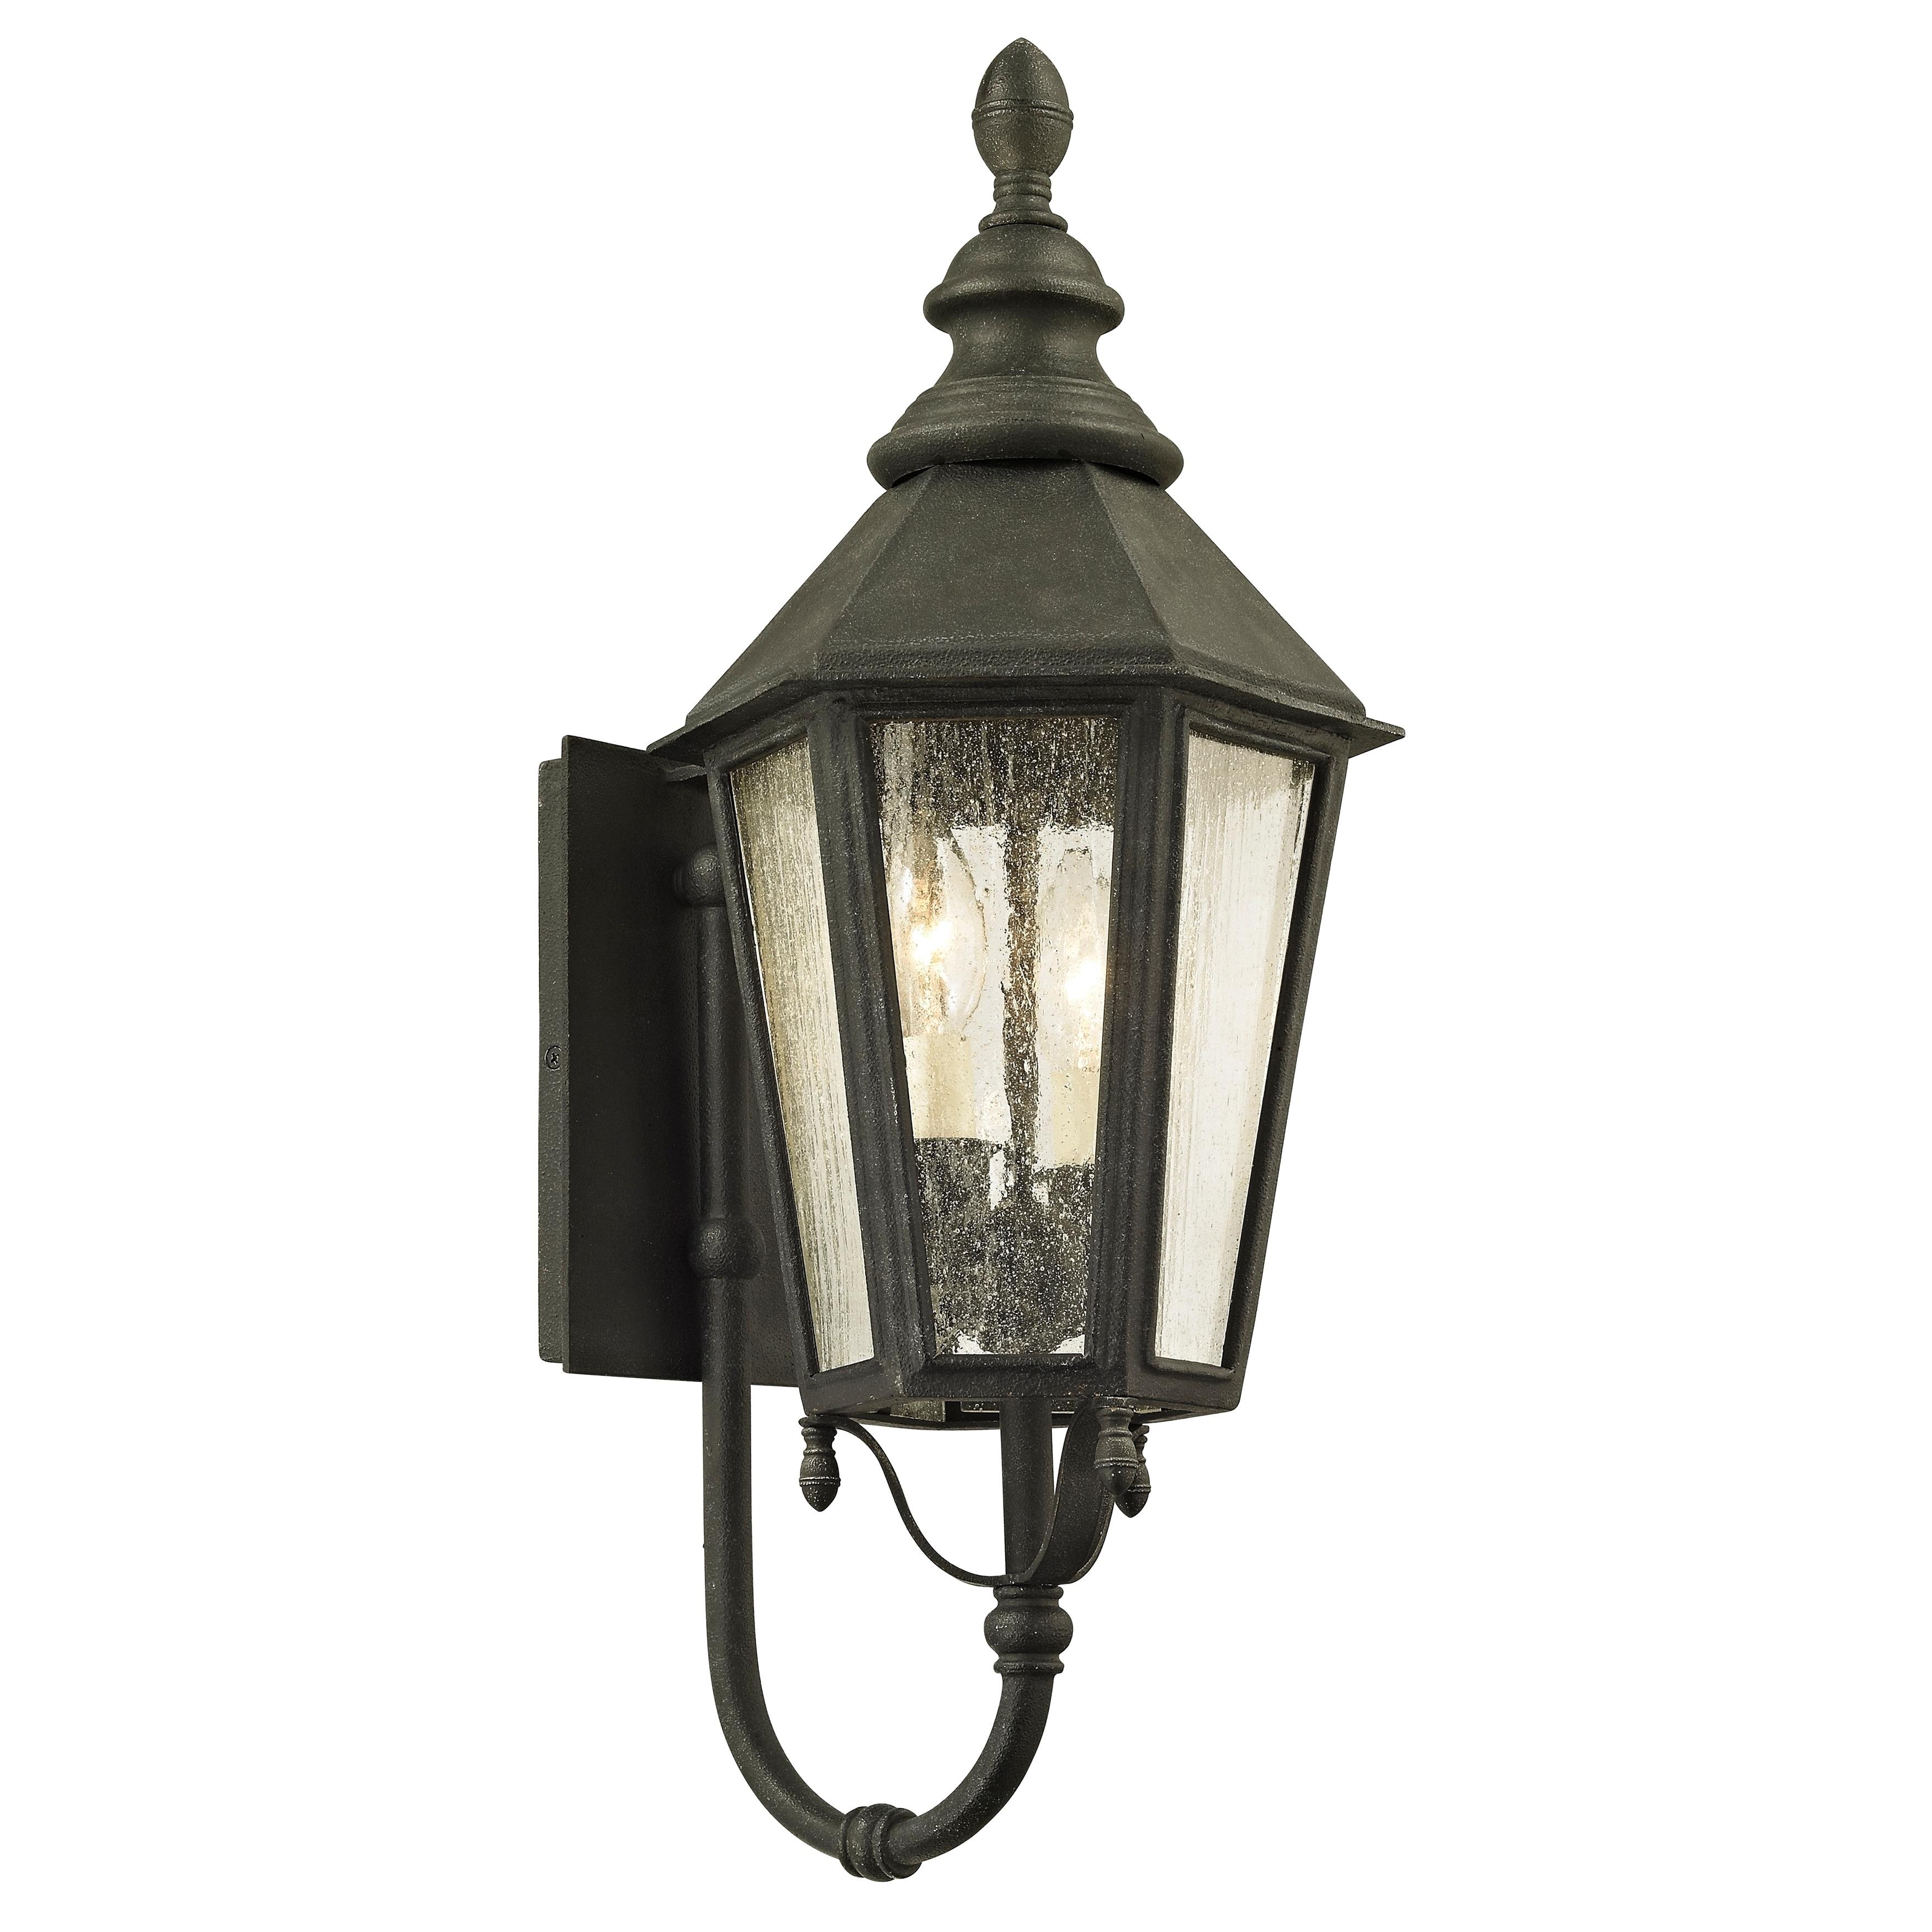 Troy lighting savannah 2 light vintage iron outdoor wall sconce